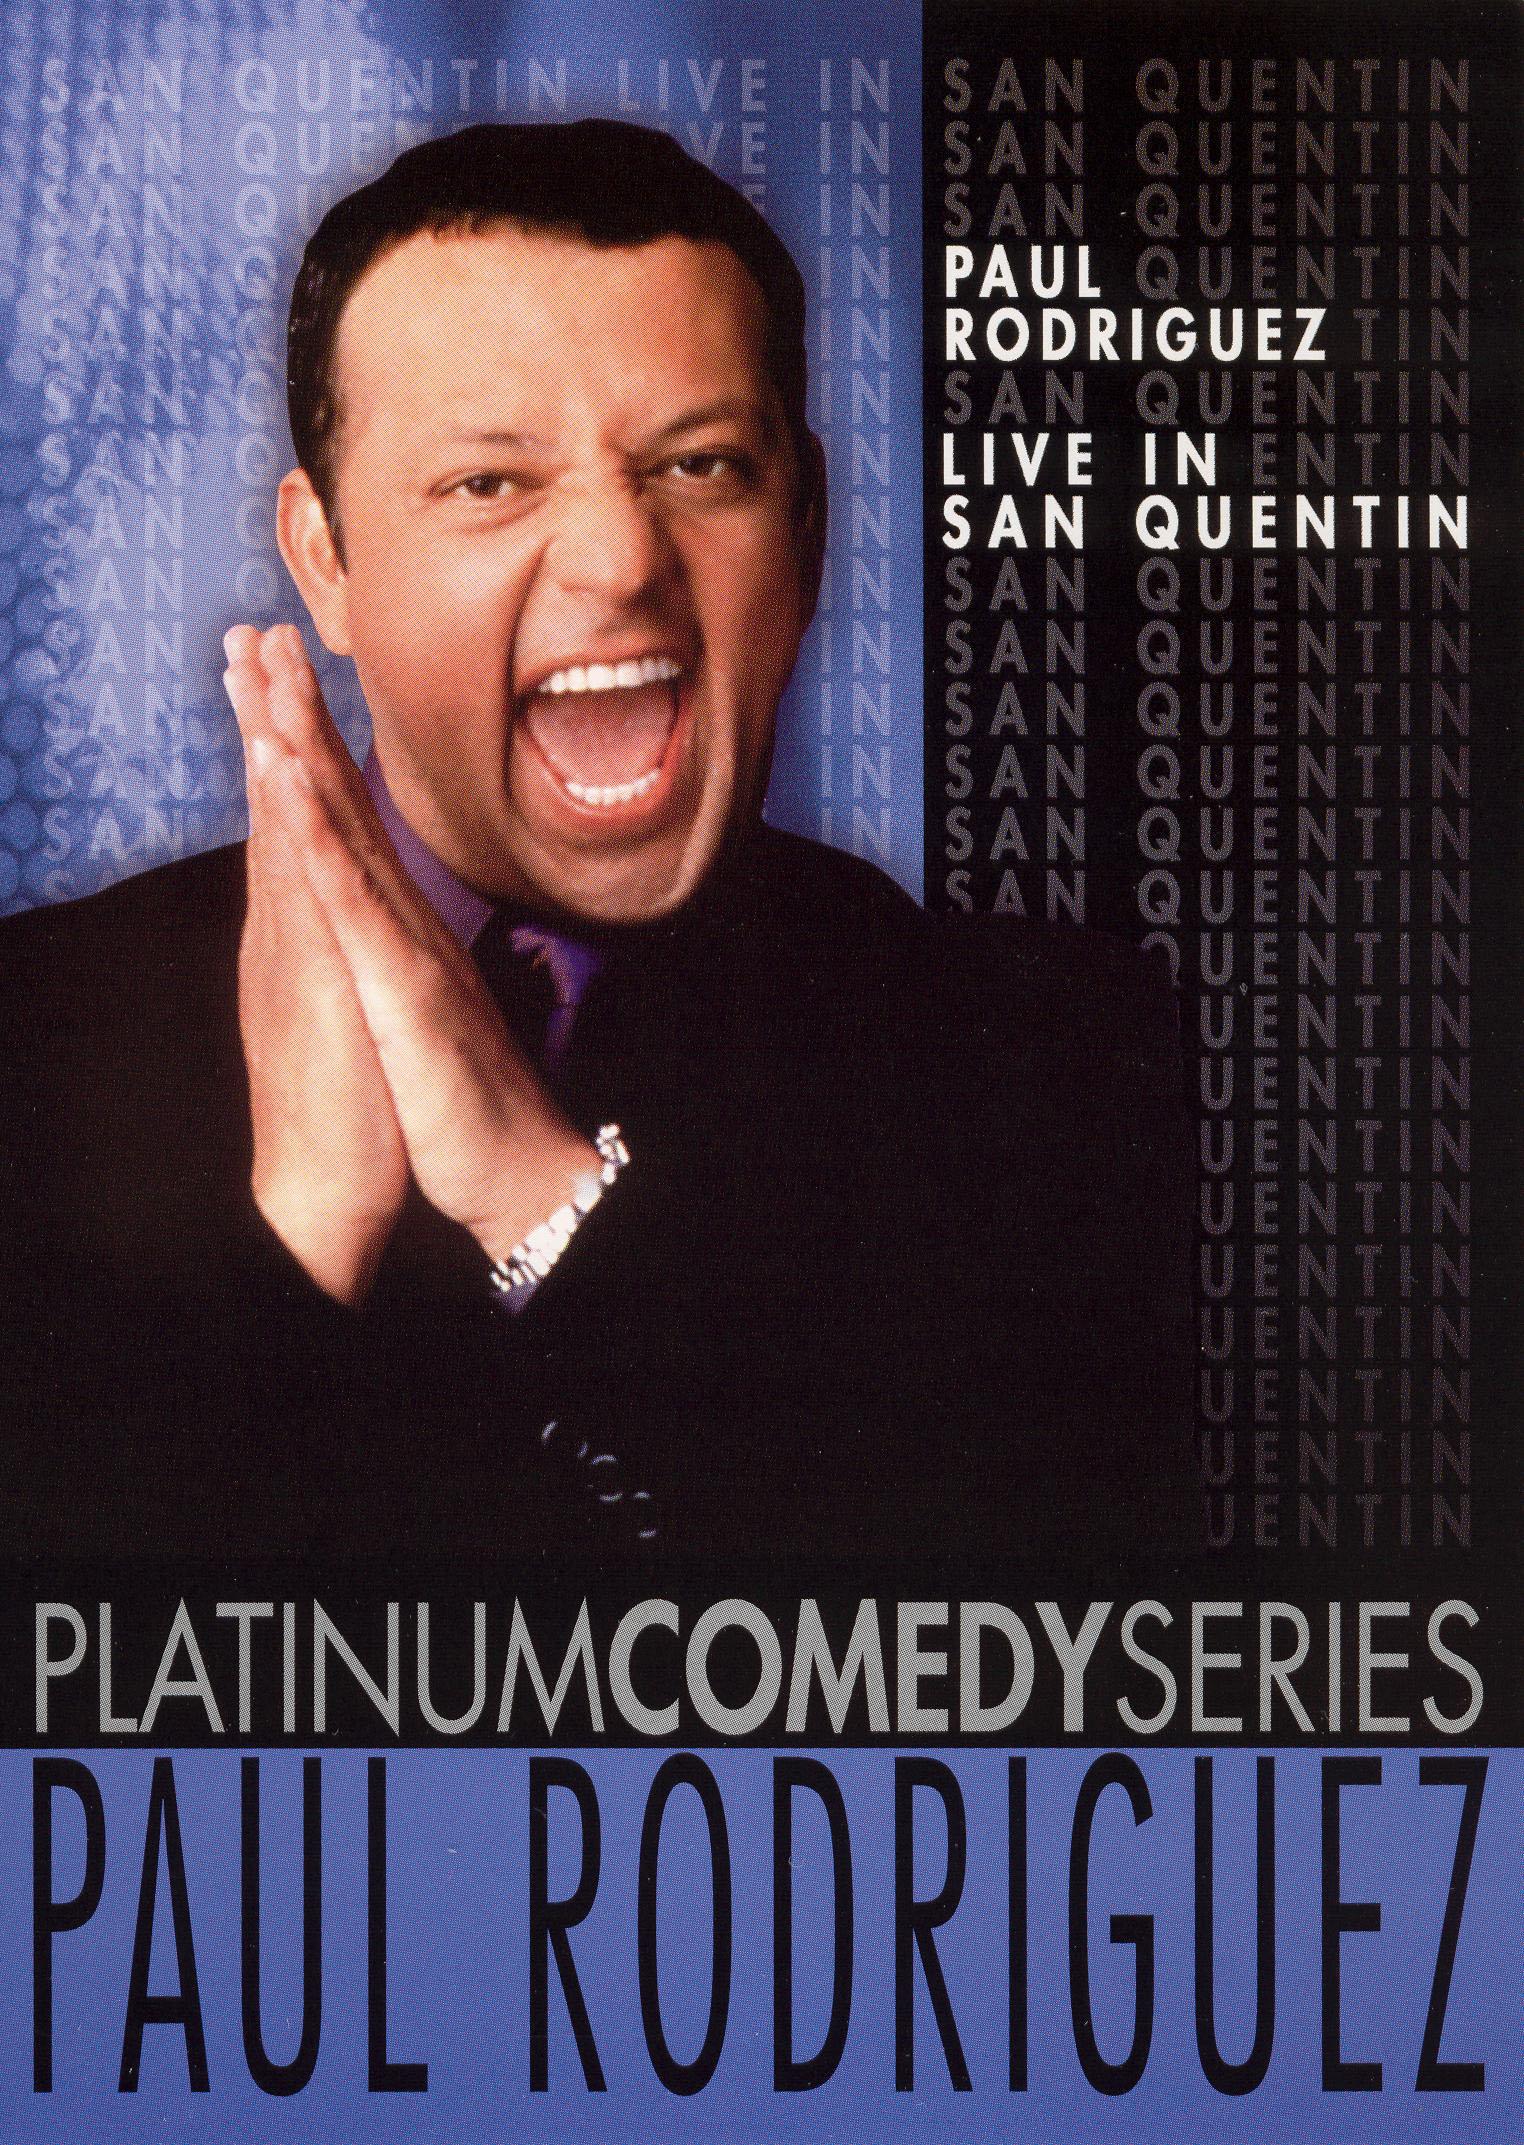 Platinum Comedy Series: Paul Rodriguez - Behind Bars Live in San Francisco